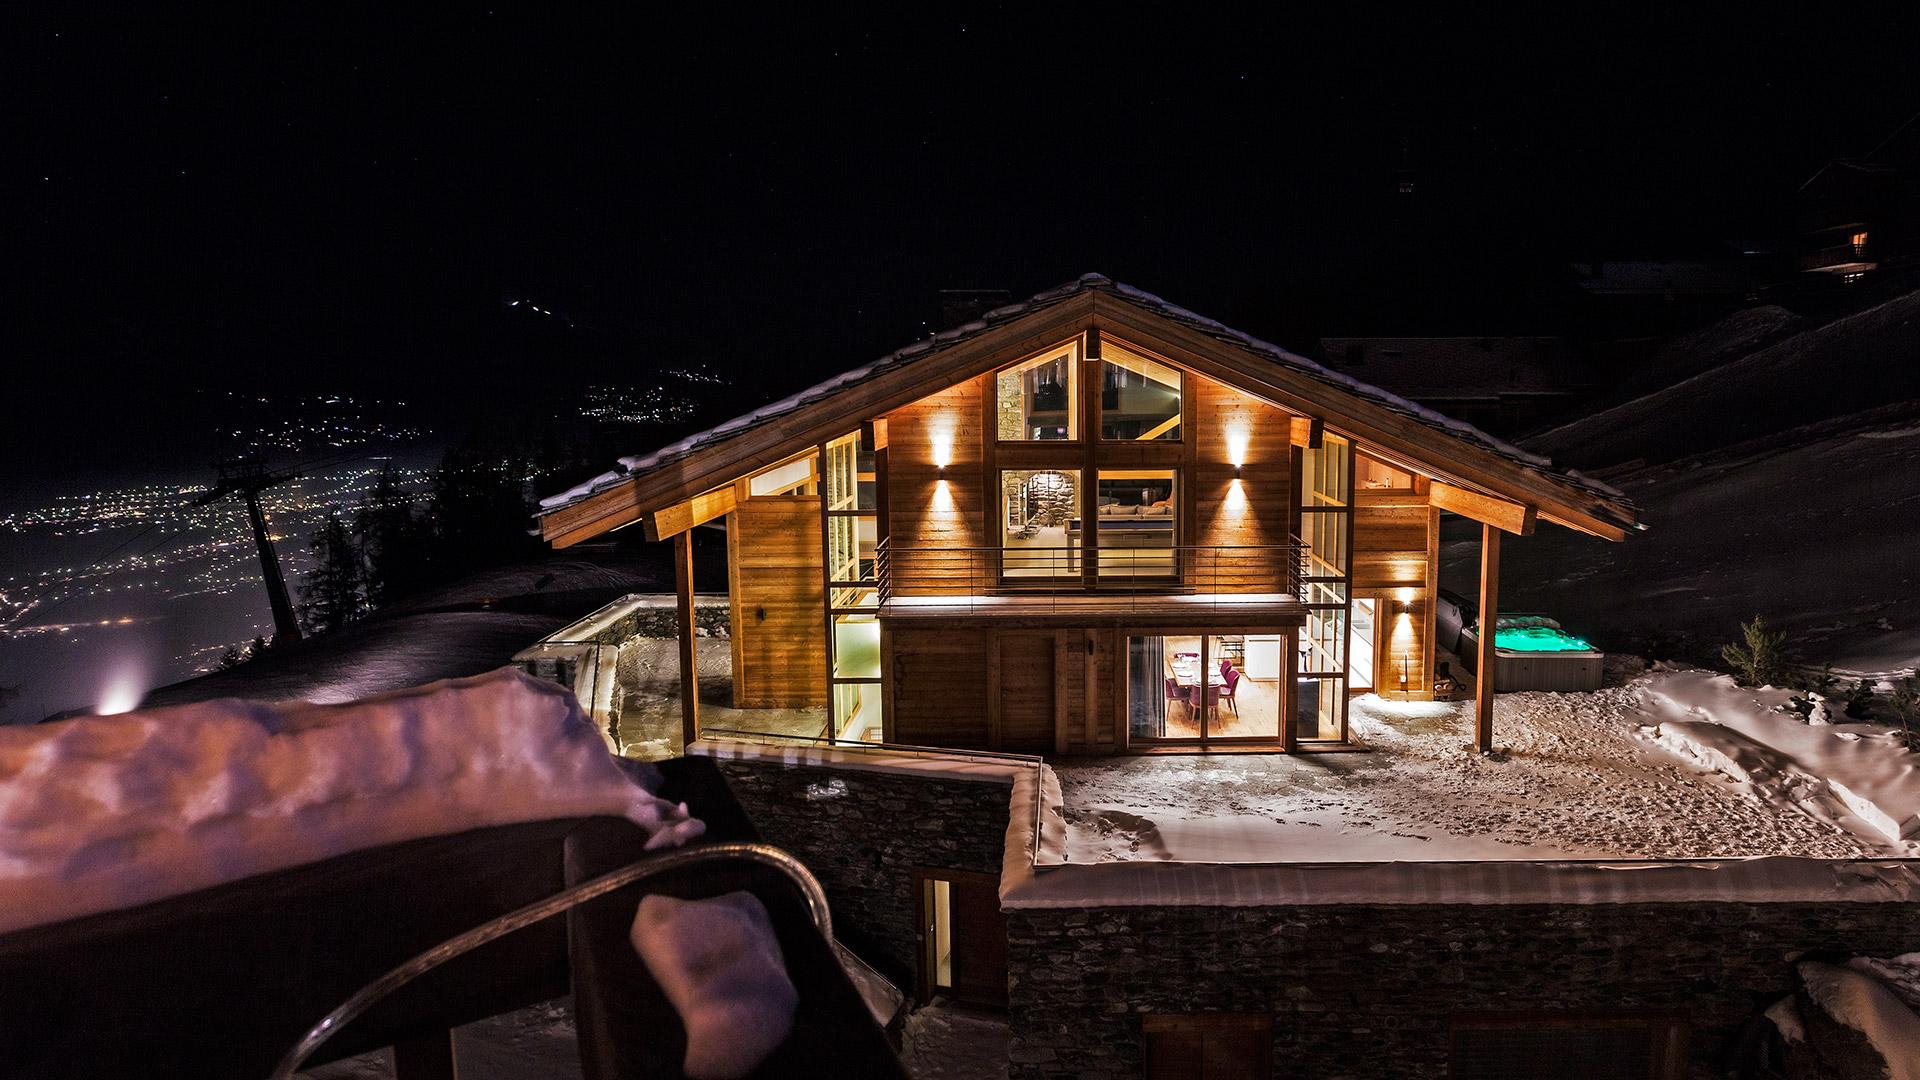 Chalet Pas du Canard Chalet, Switzerland